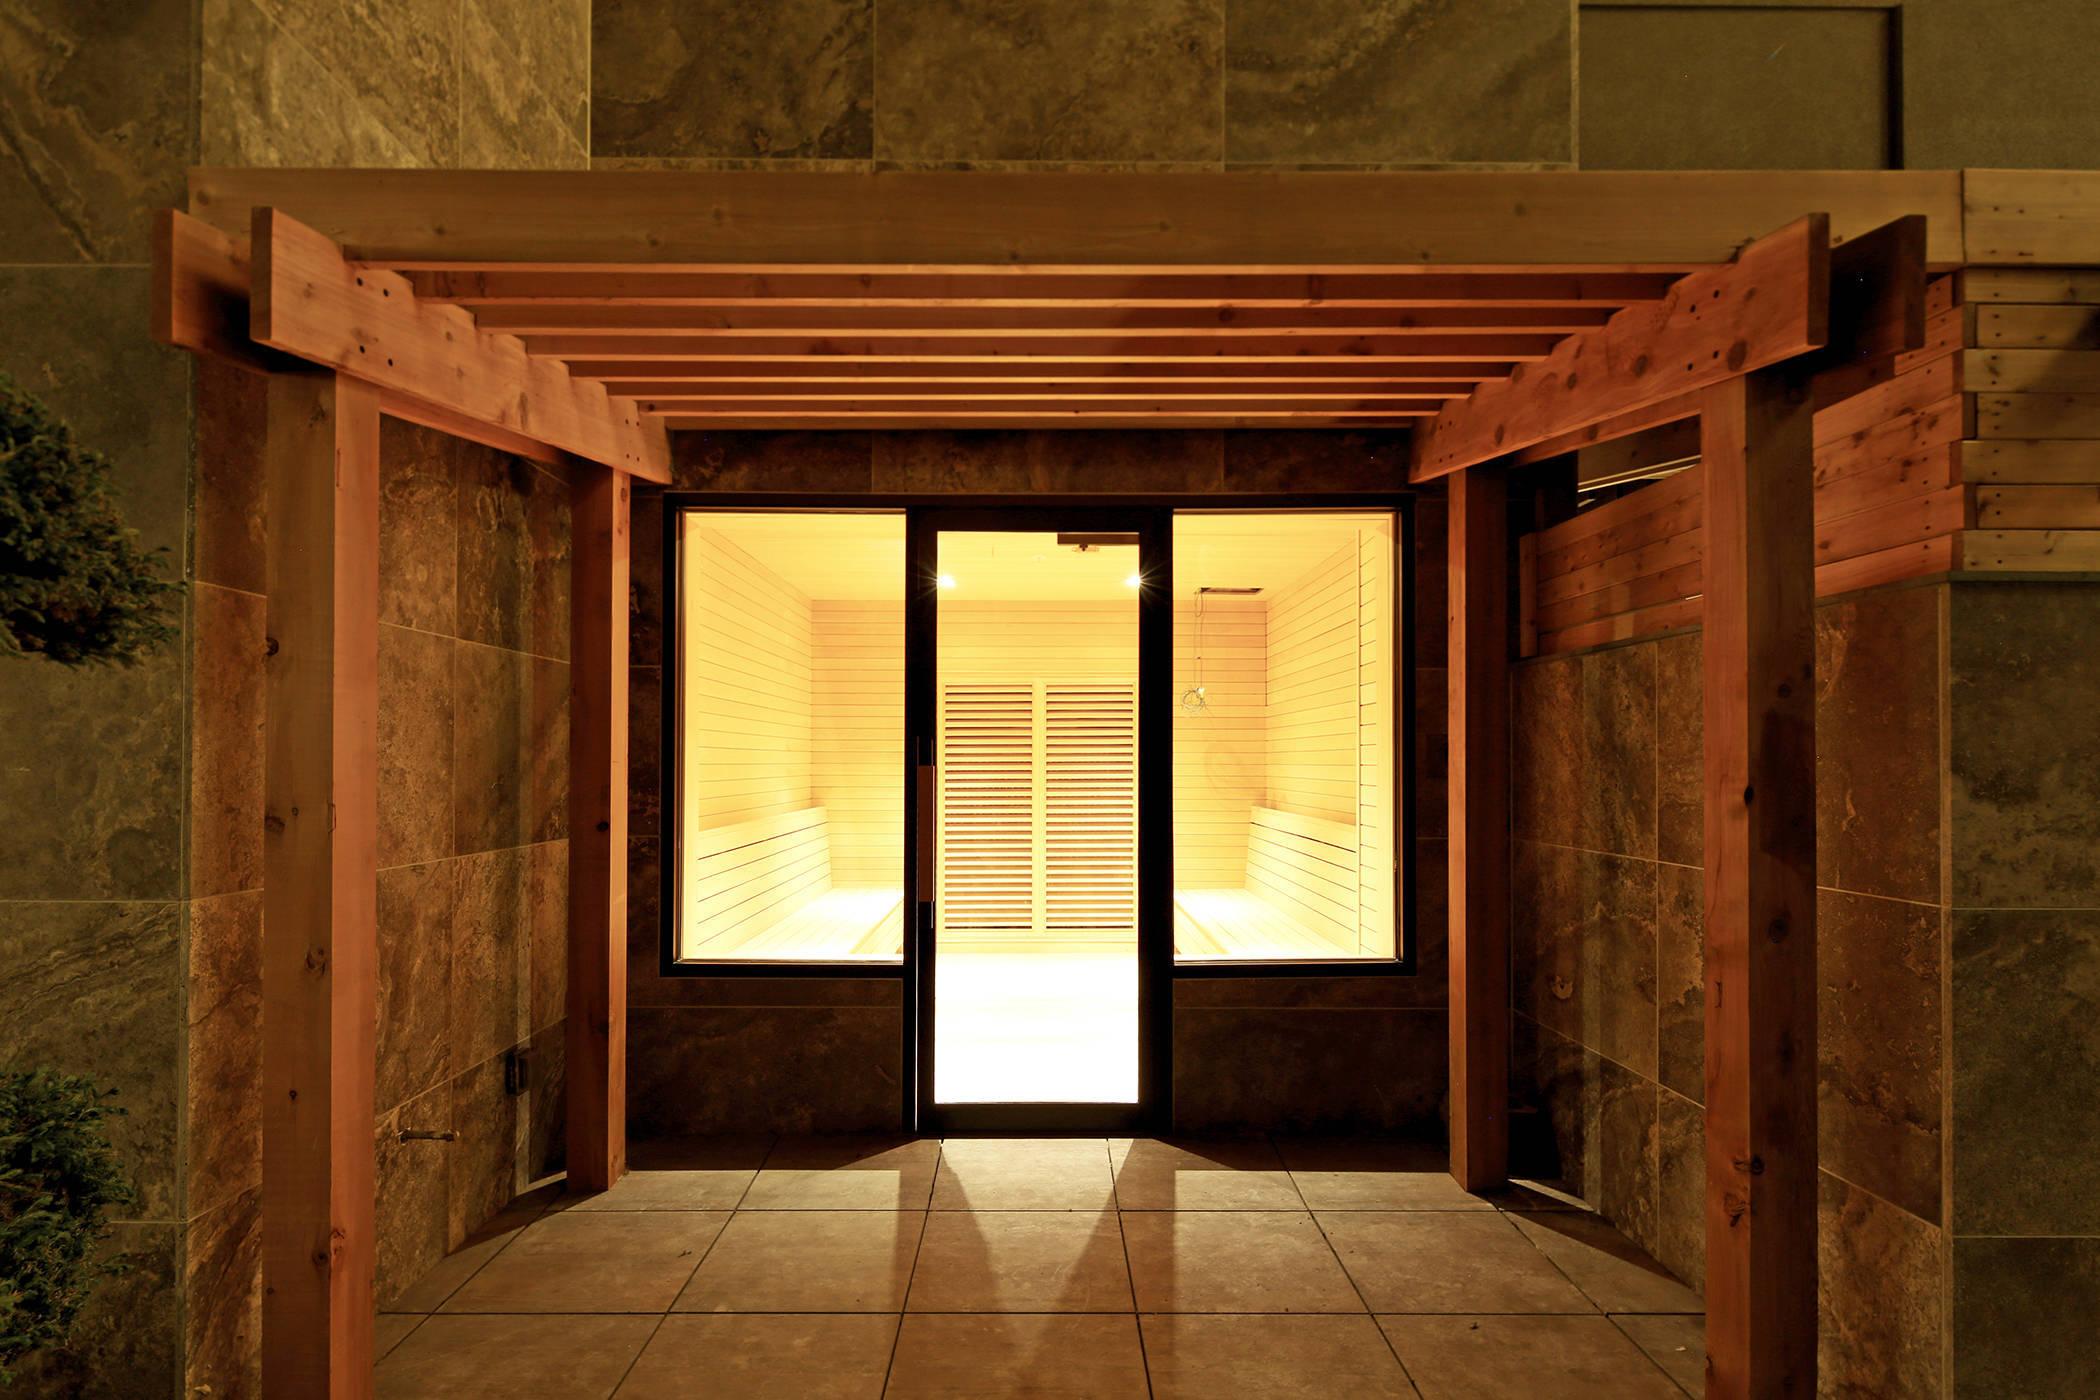 2c6a301bdff04102f4bb_SoJoSpaClub-Sauna2.jpg